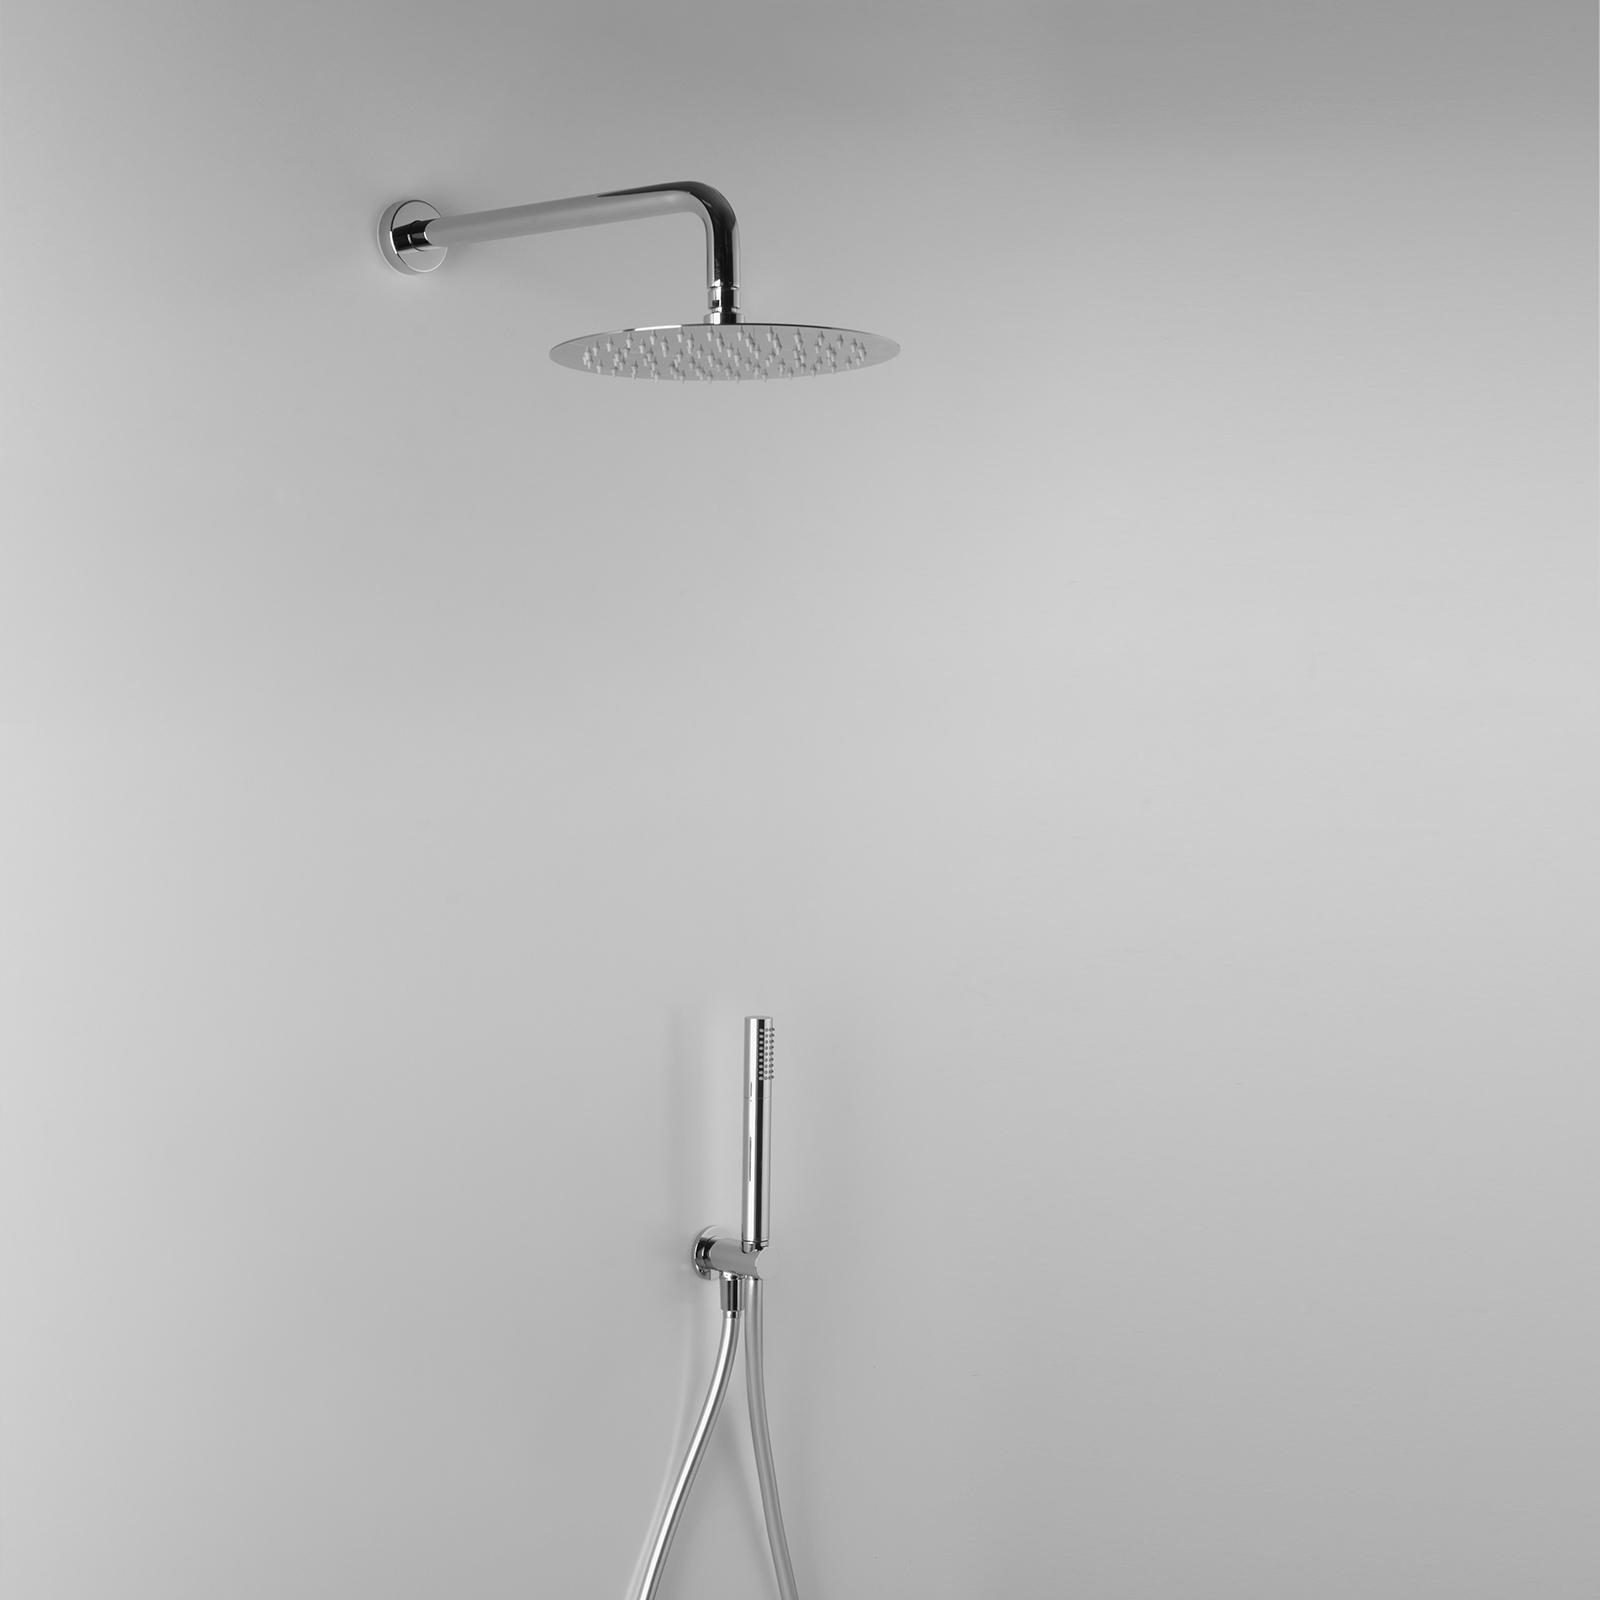 Set doccia tondo Ares con soffione diametro 25 cm, braccio doccia e kit diplex